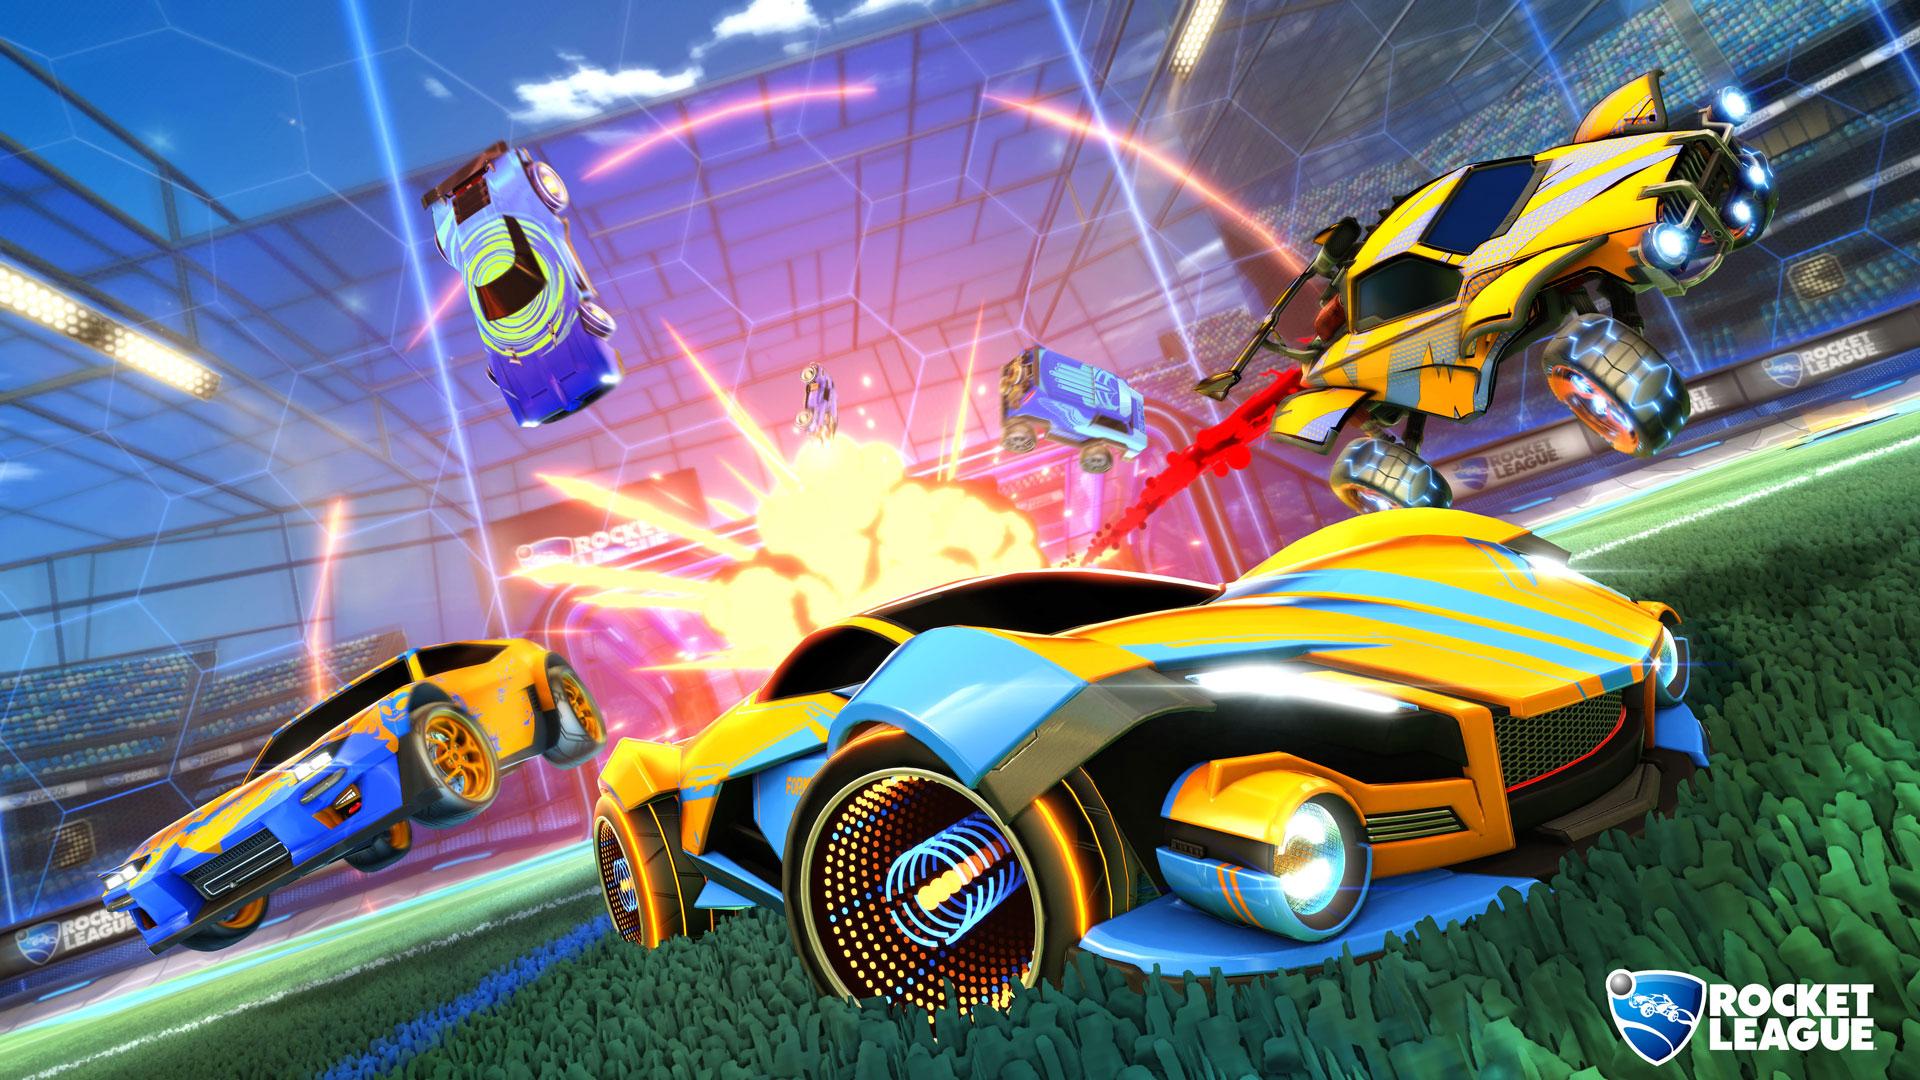 Rocket League's big roadmap includes the long-awaited cross-platform parties coming this summer screenshot